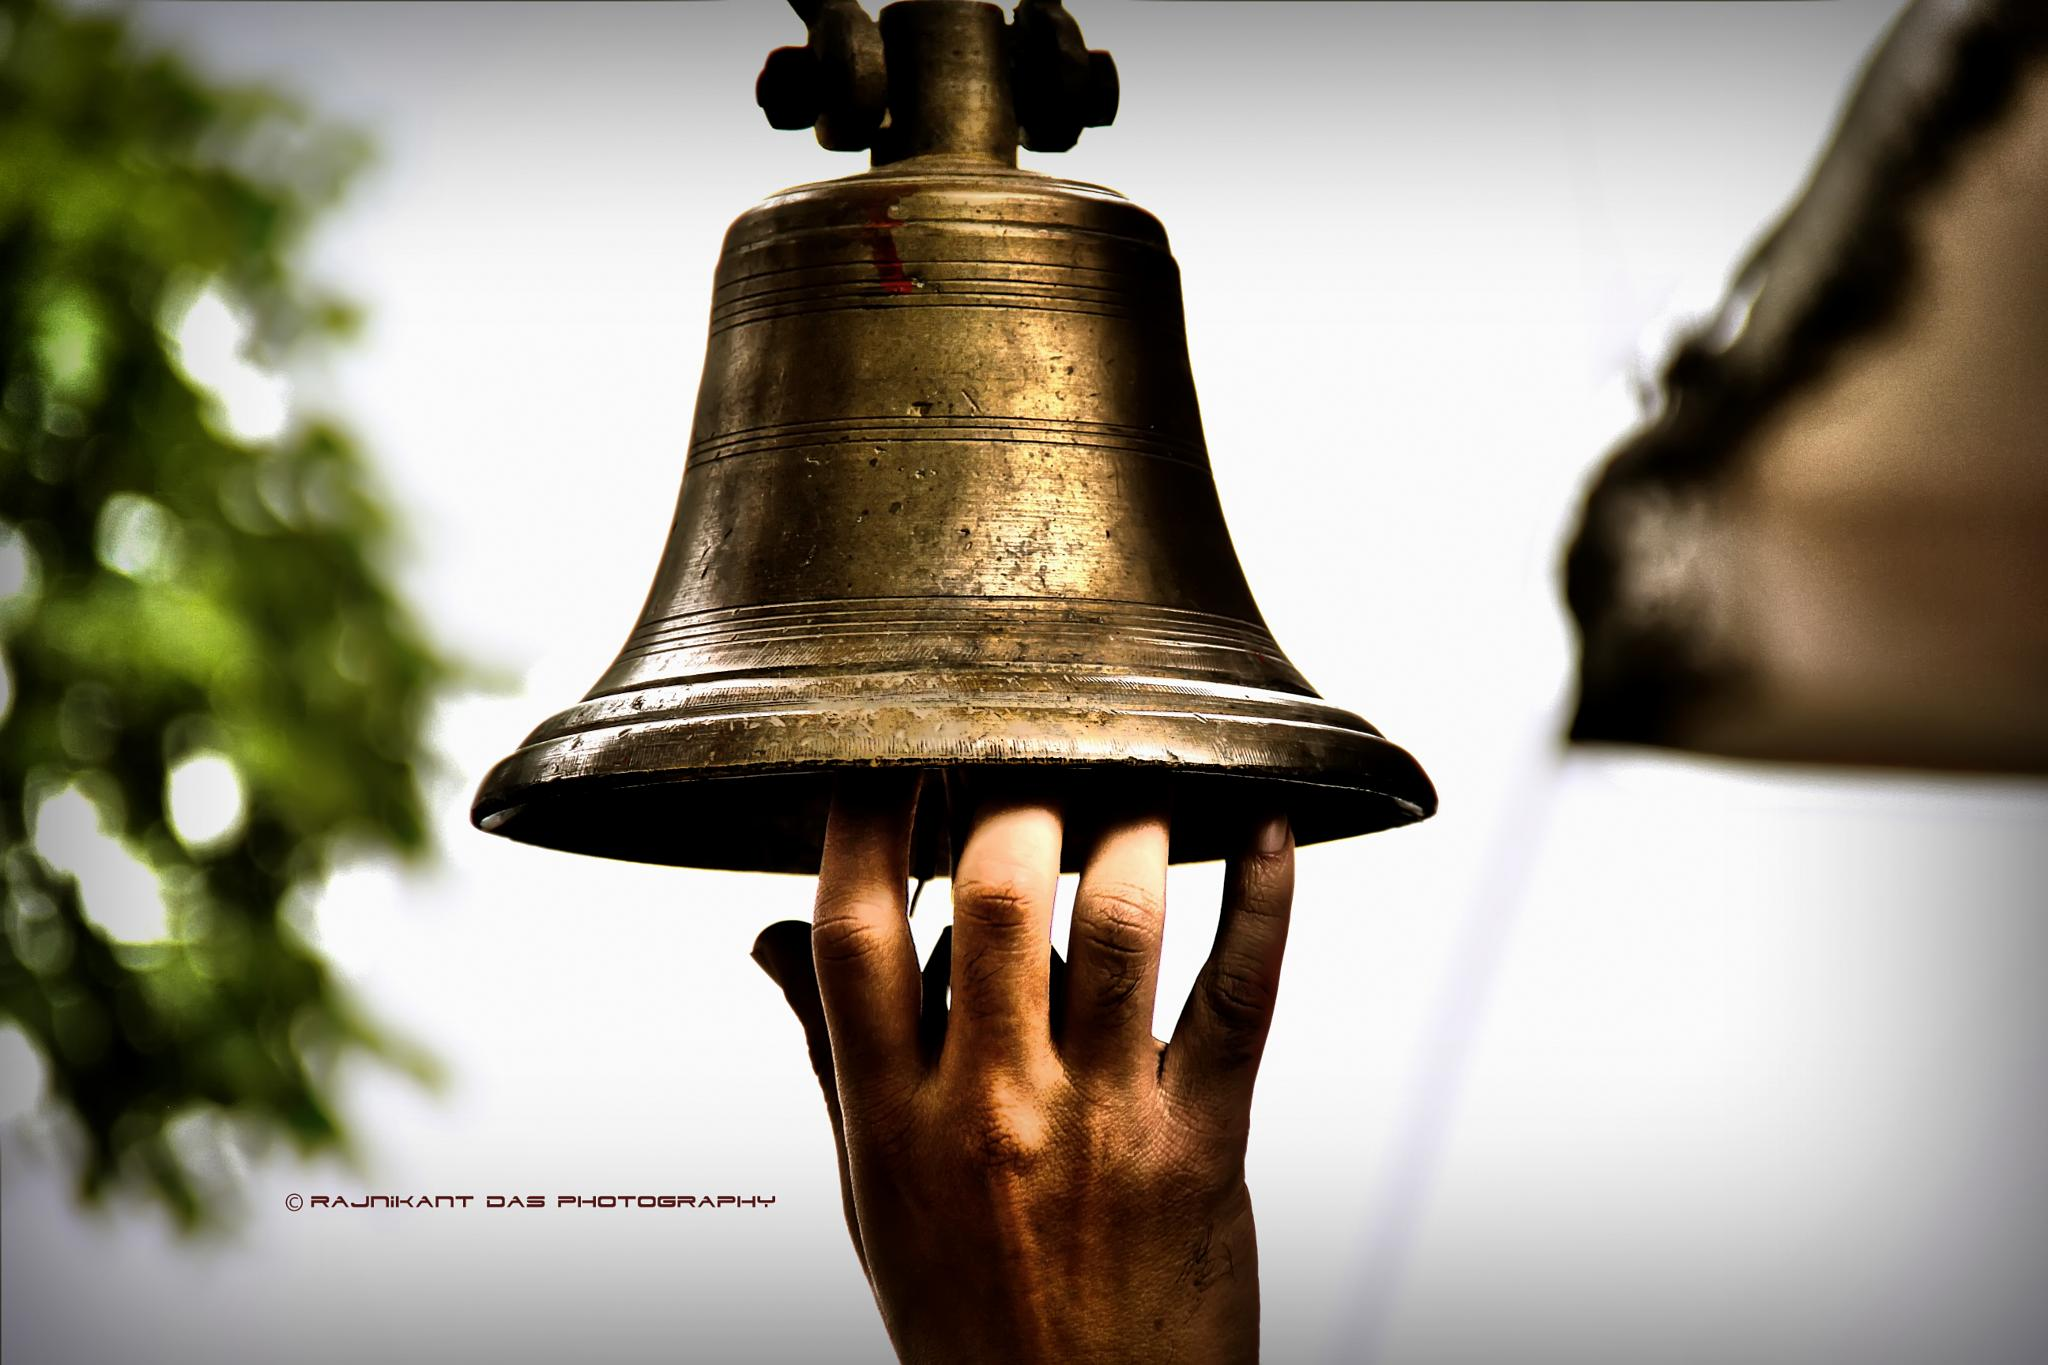 Divine Bell by Rajnikant Das